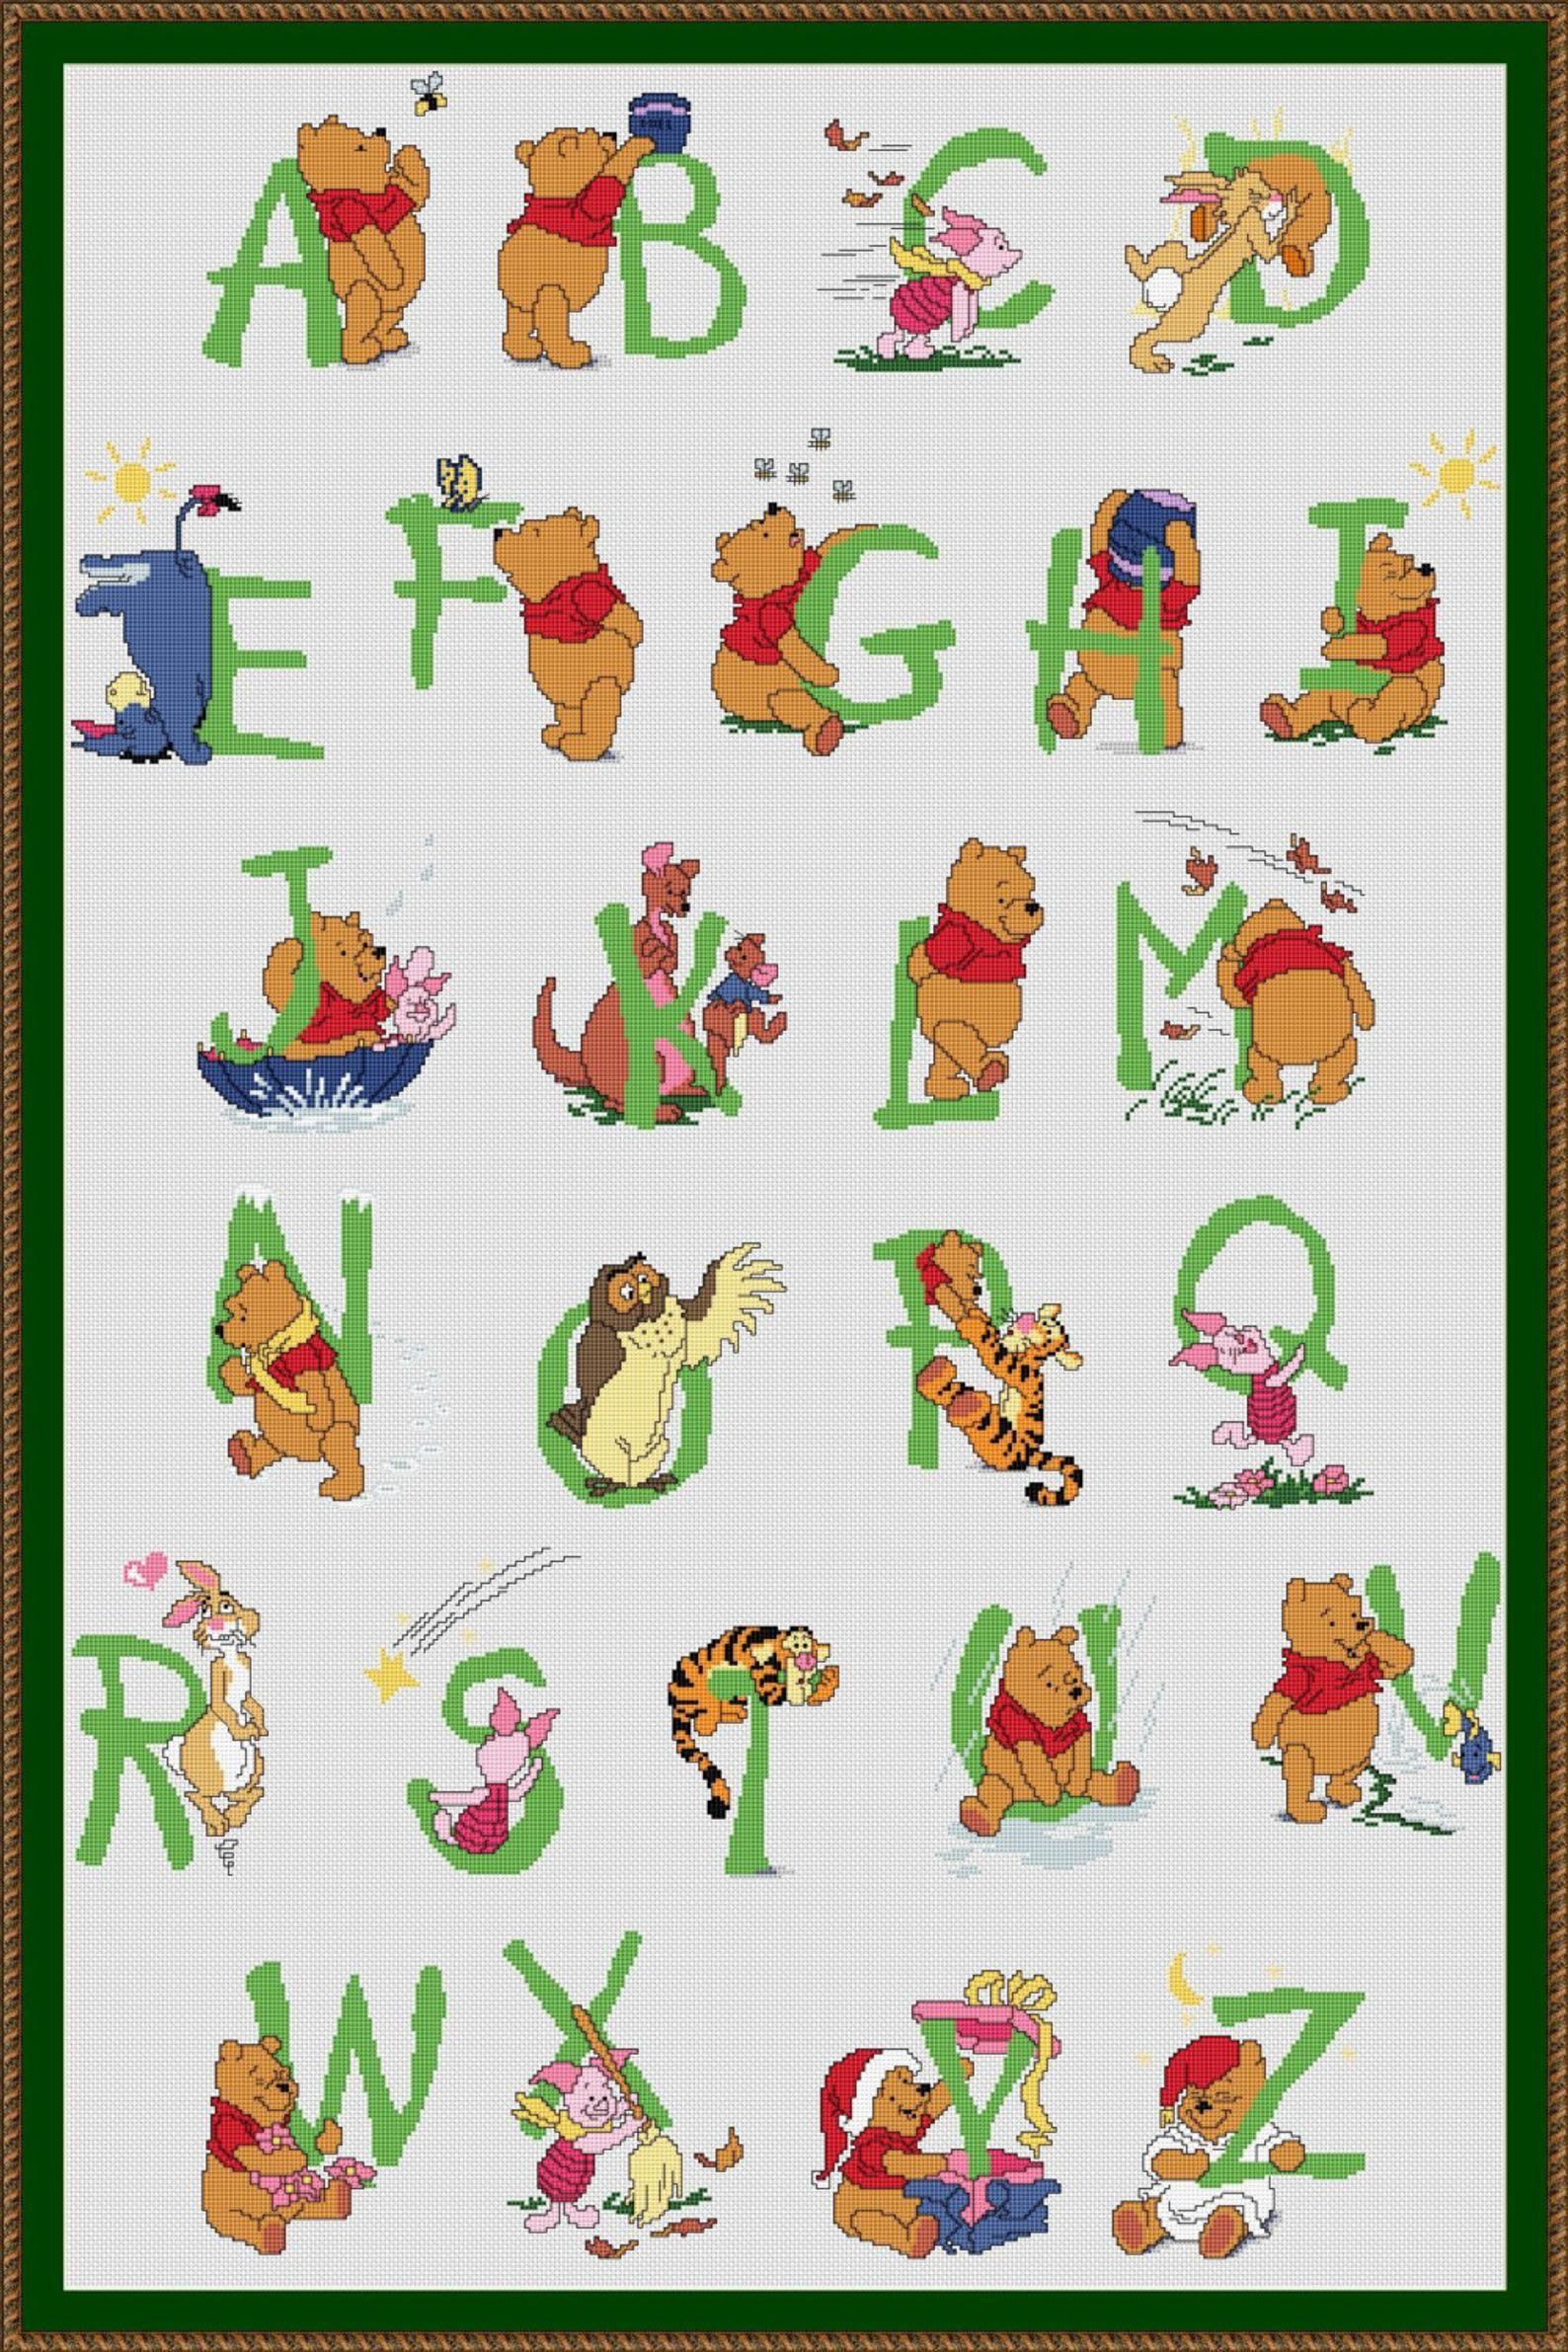 Winnie Alphabet Cross Stitch Patterns Cross Stitch Fonts Alphabet Engraved Abc Letters Lettering Text Characters Cross Stitch 016 Borduurpatronen Borduren Etsy